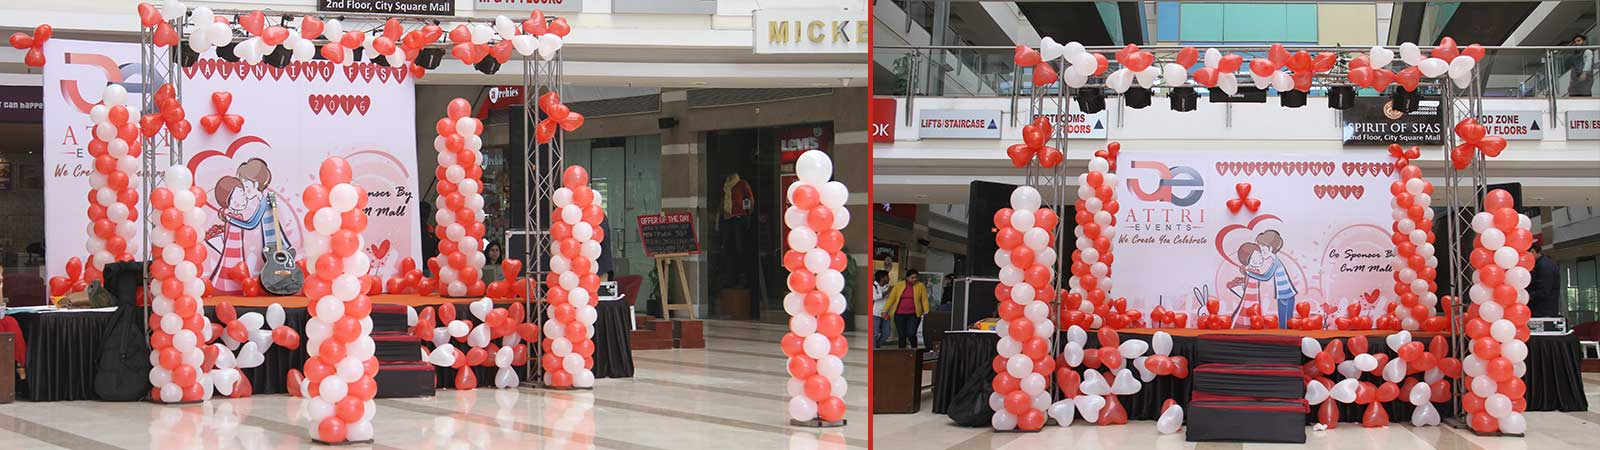 Balloon Decoration Birthday Decorations Party Decorations